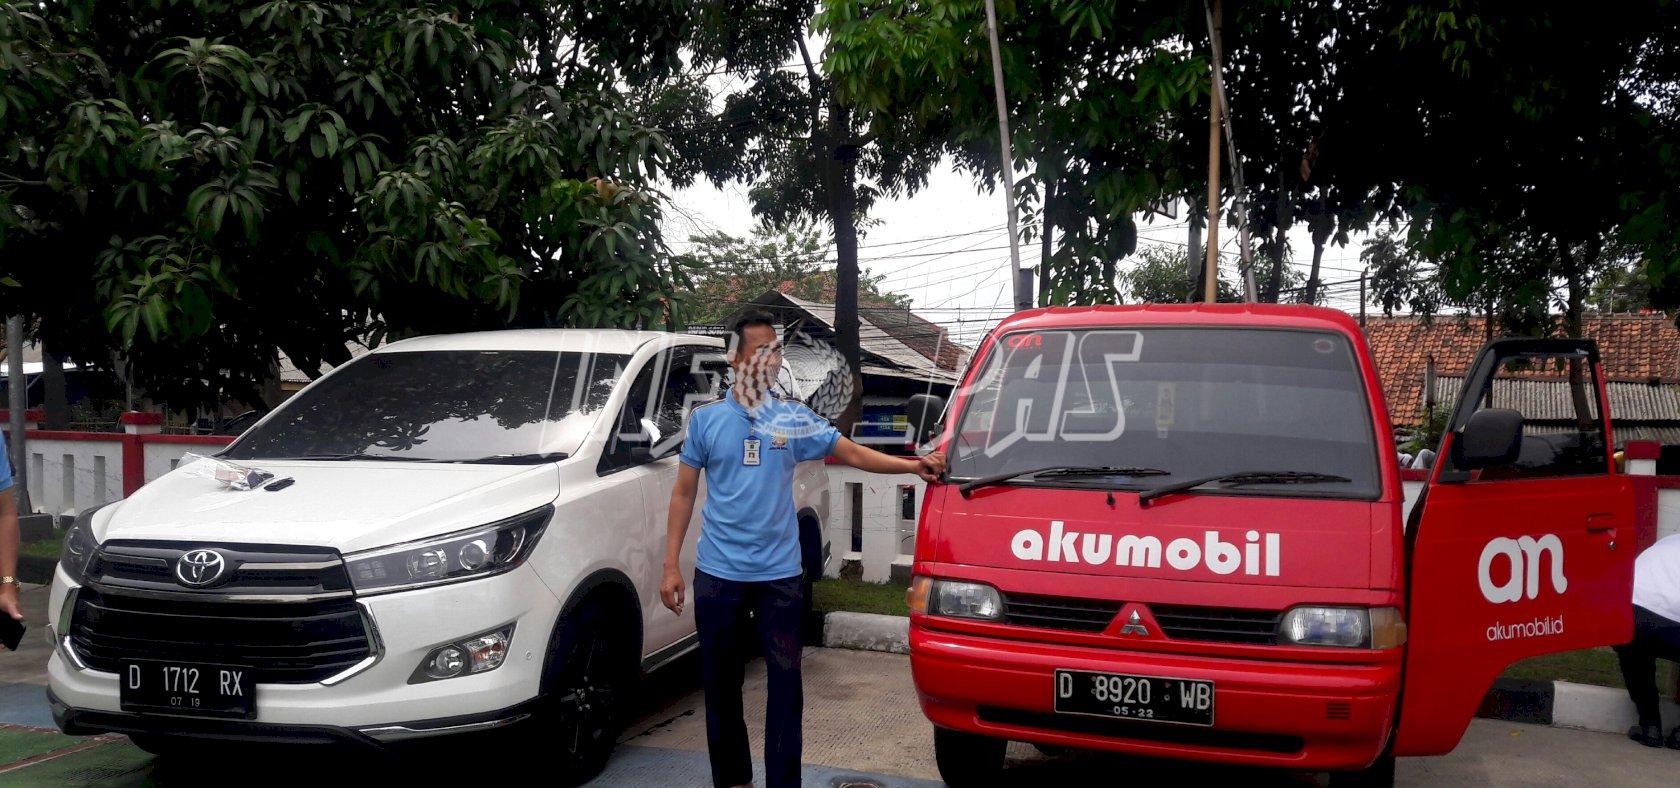 Rupbasan Bandung Simpan 10 KR4 & 5 KR2 Titipan Polrestabes Bandung